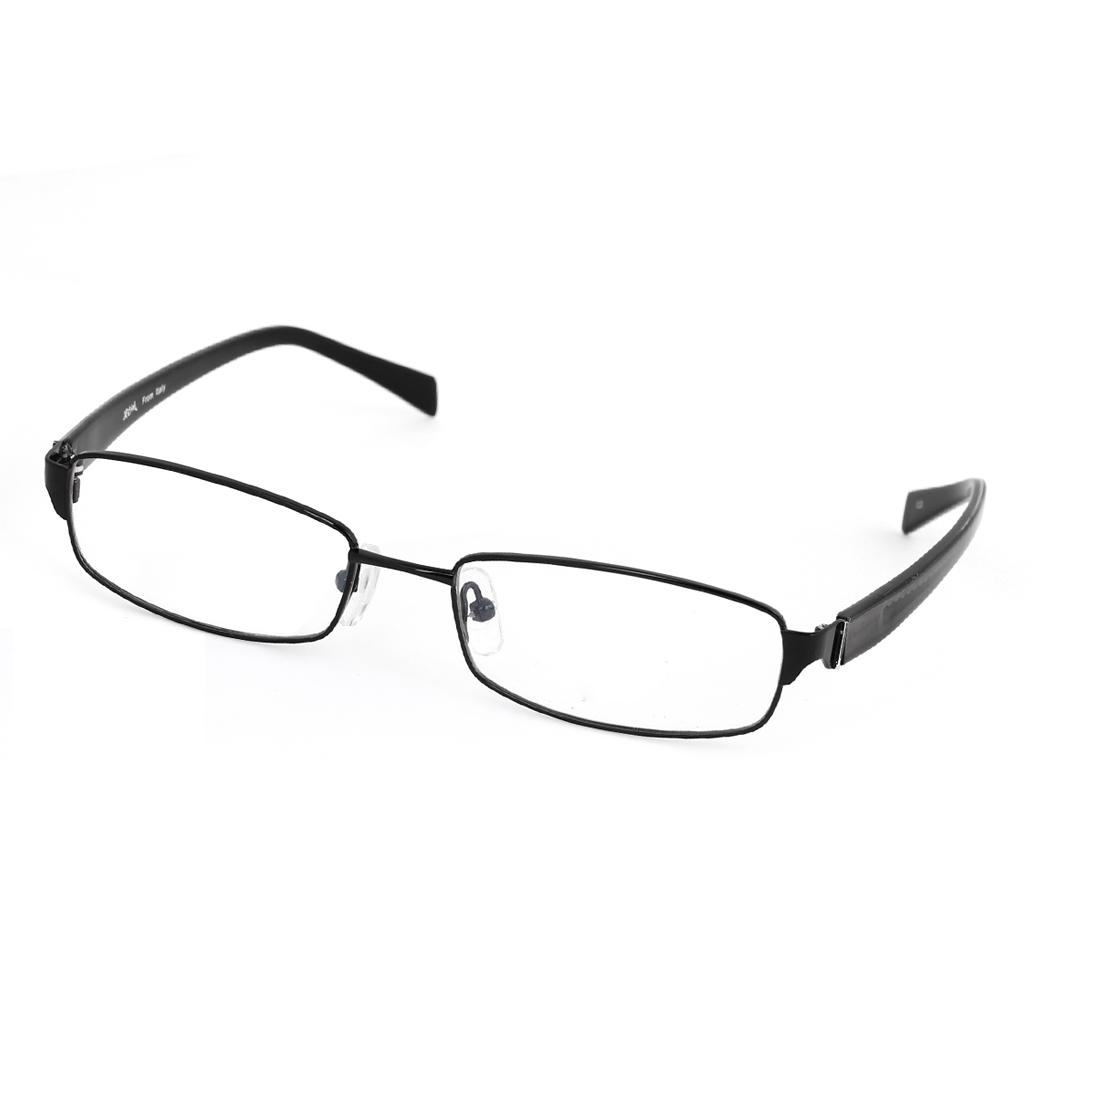 Unisex Plastic Rectangle Rim Black Arm Nose Pads MC Lens Plano Glasses